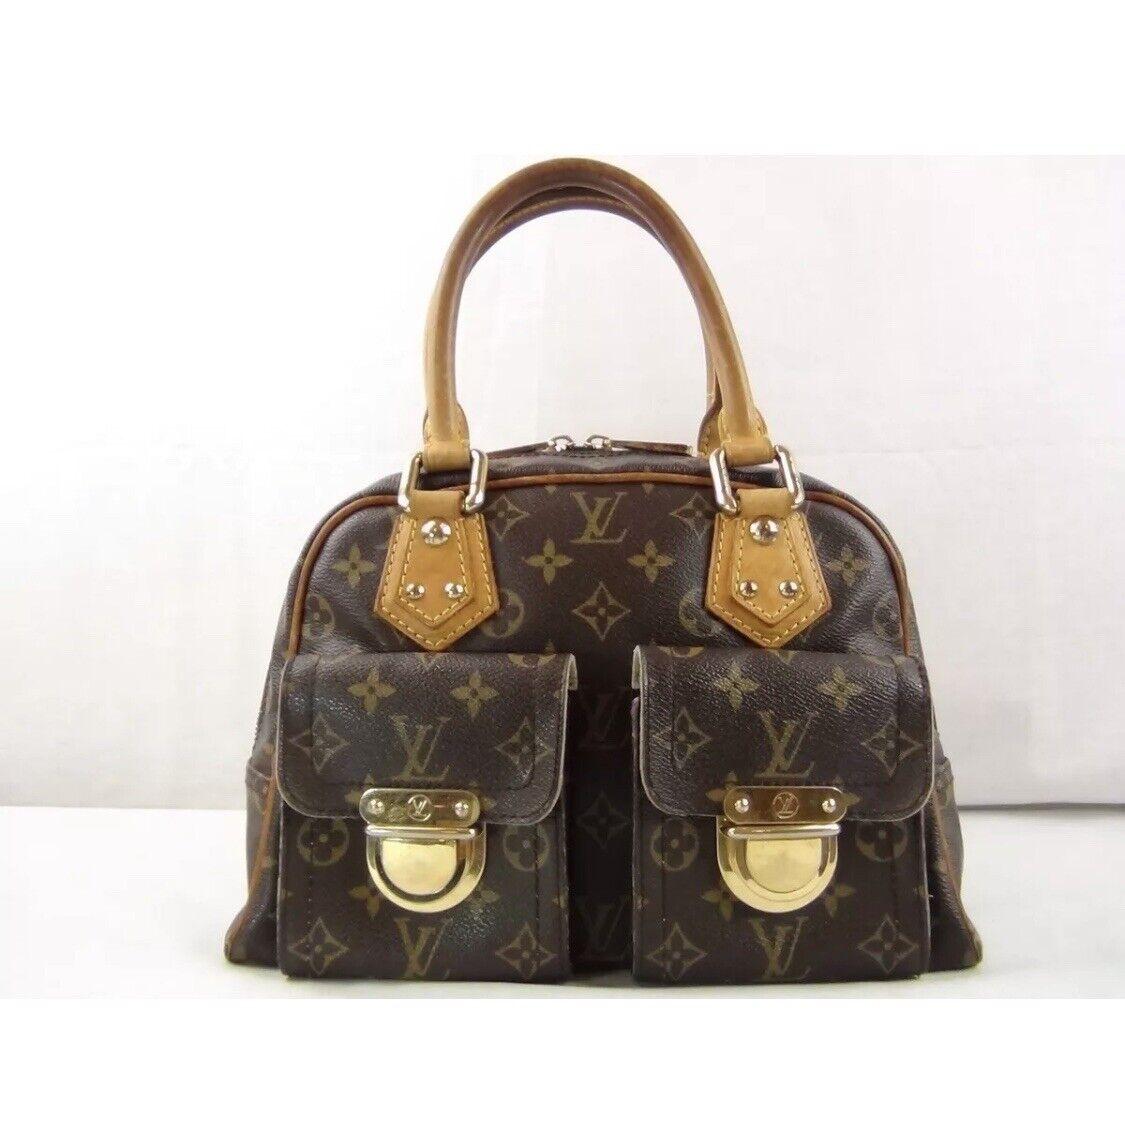 Louis Vuitton Ellipse Pm Monogram